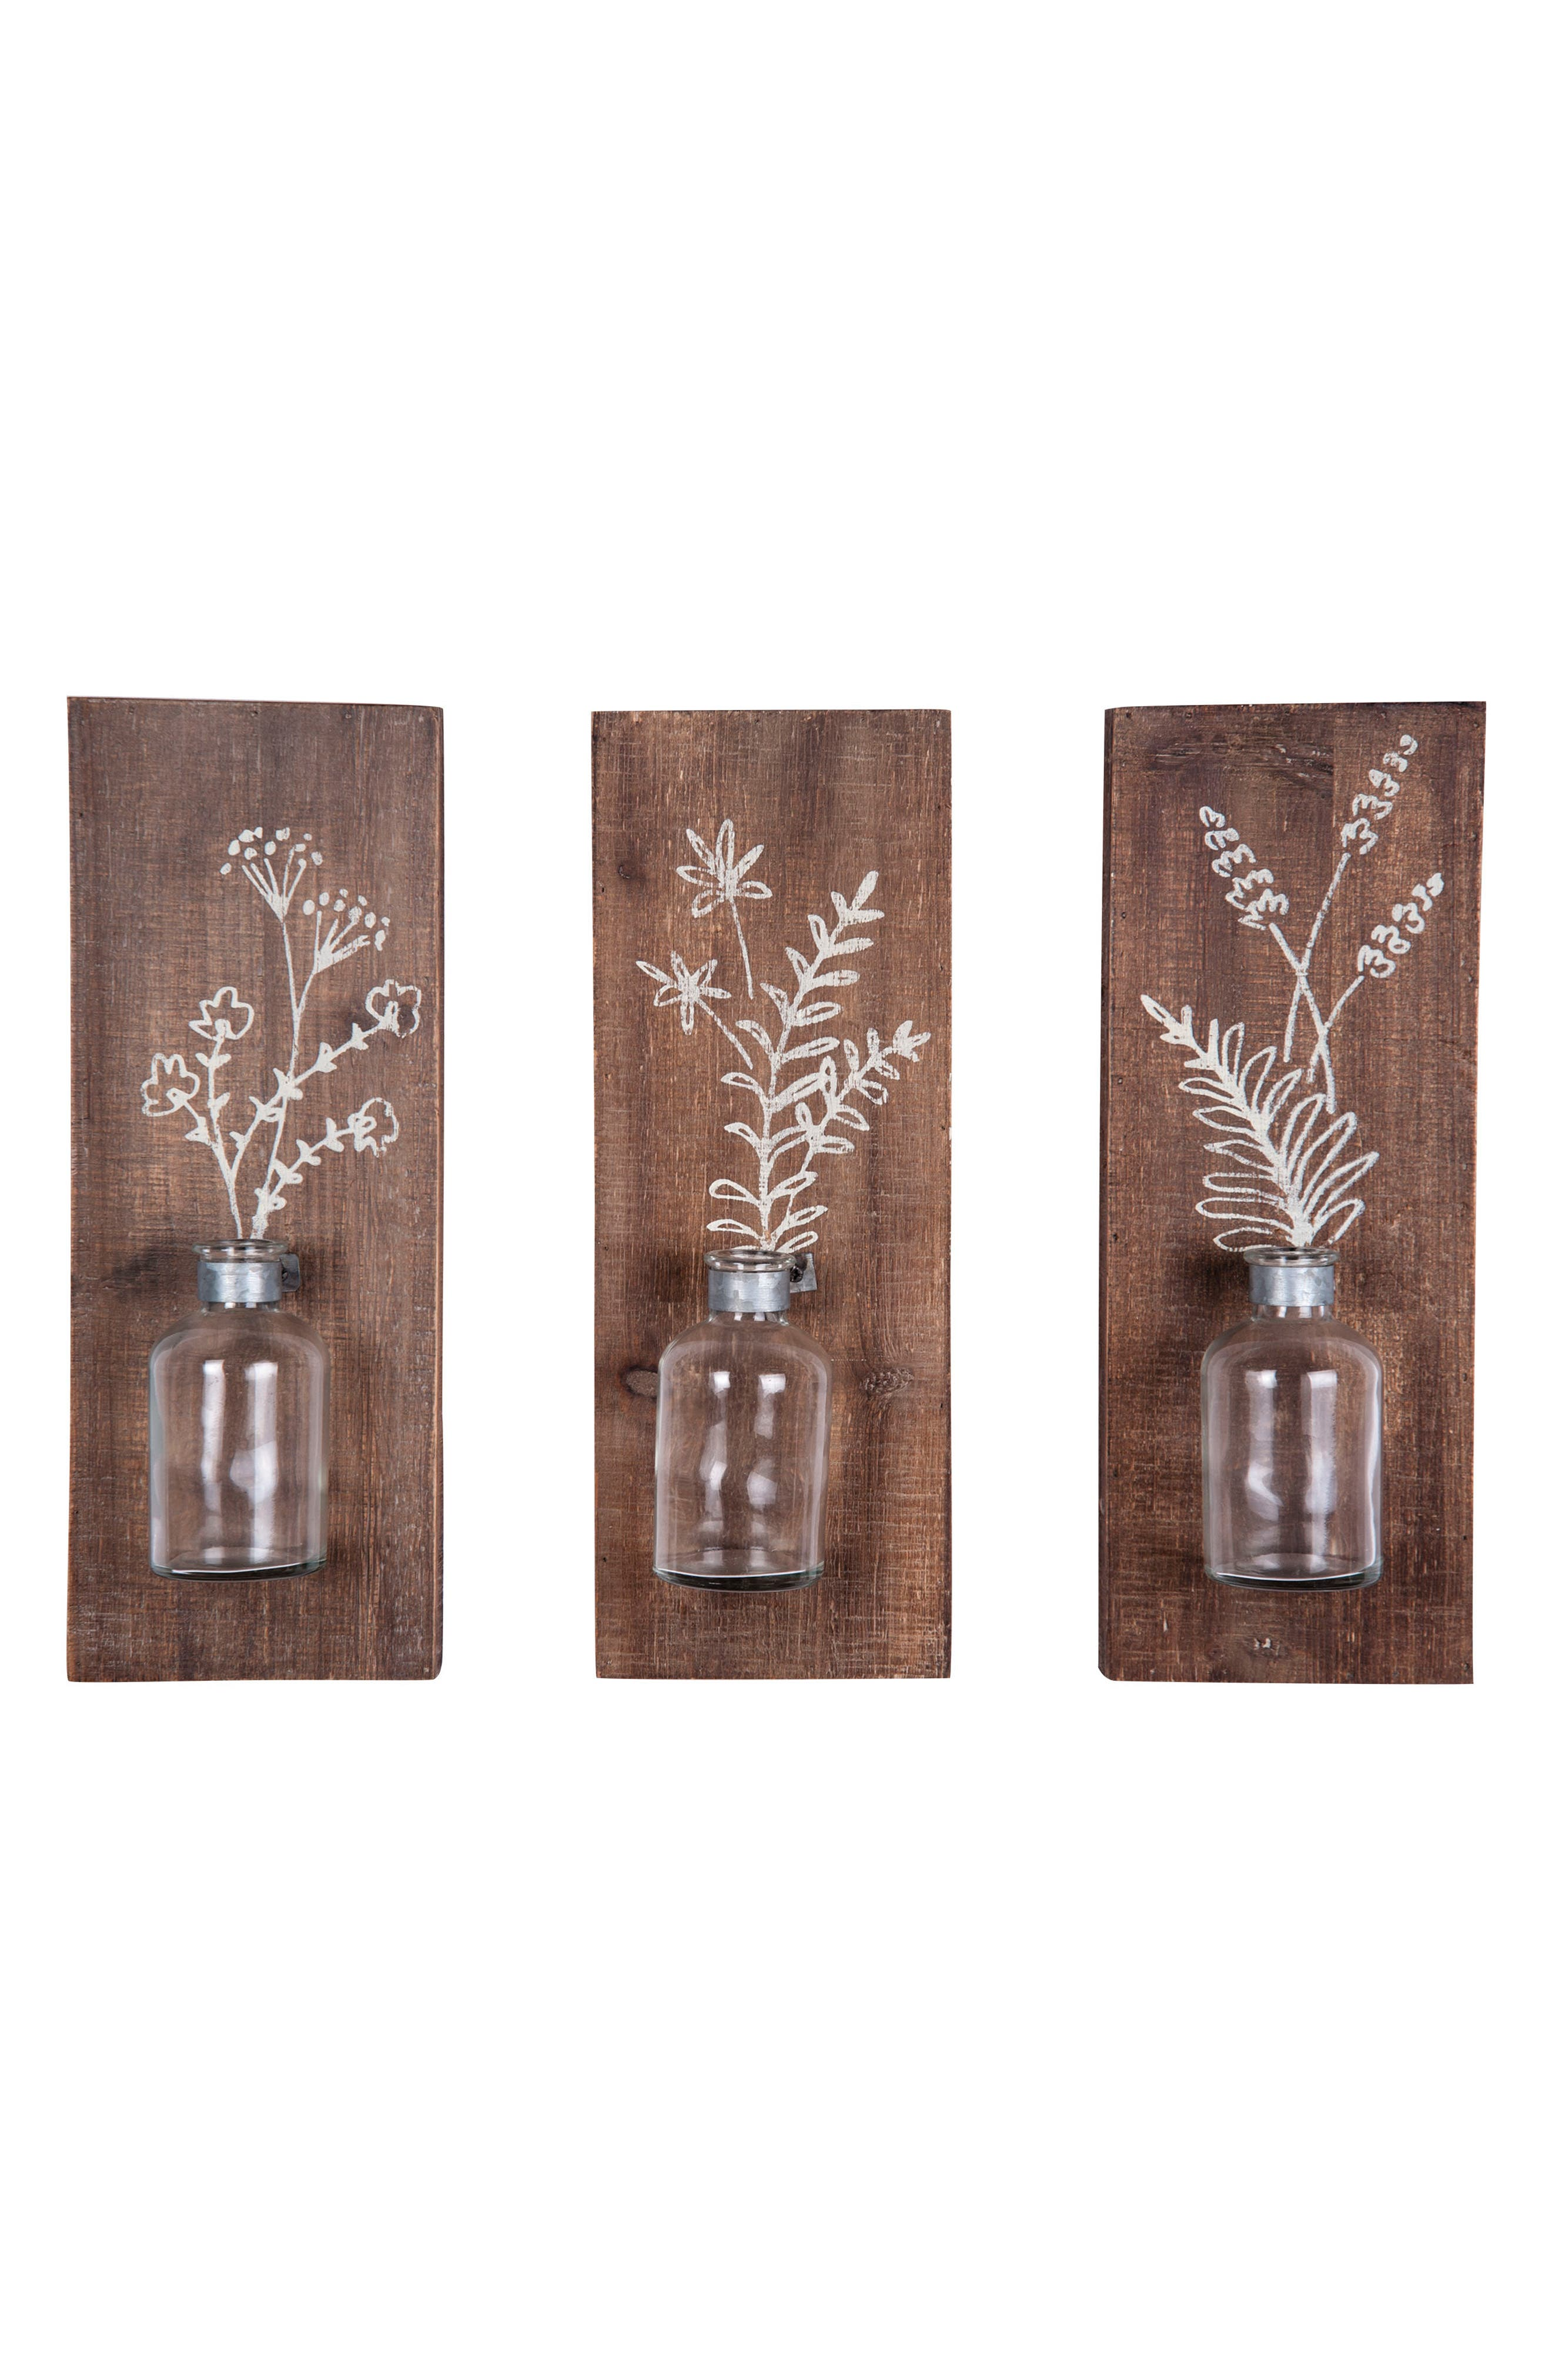 Fern Set of 3 Wall Vases,                             Main thumbnail 1, color,                             200